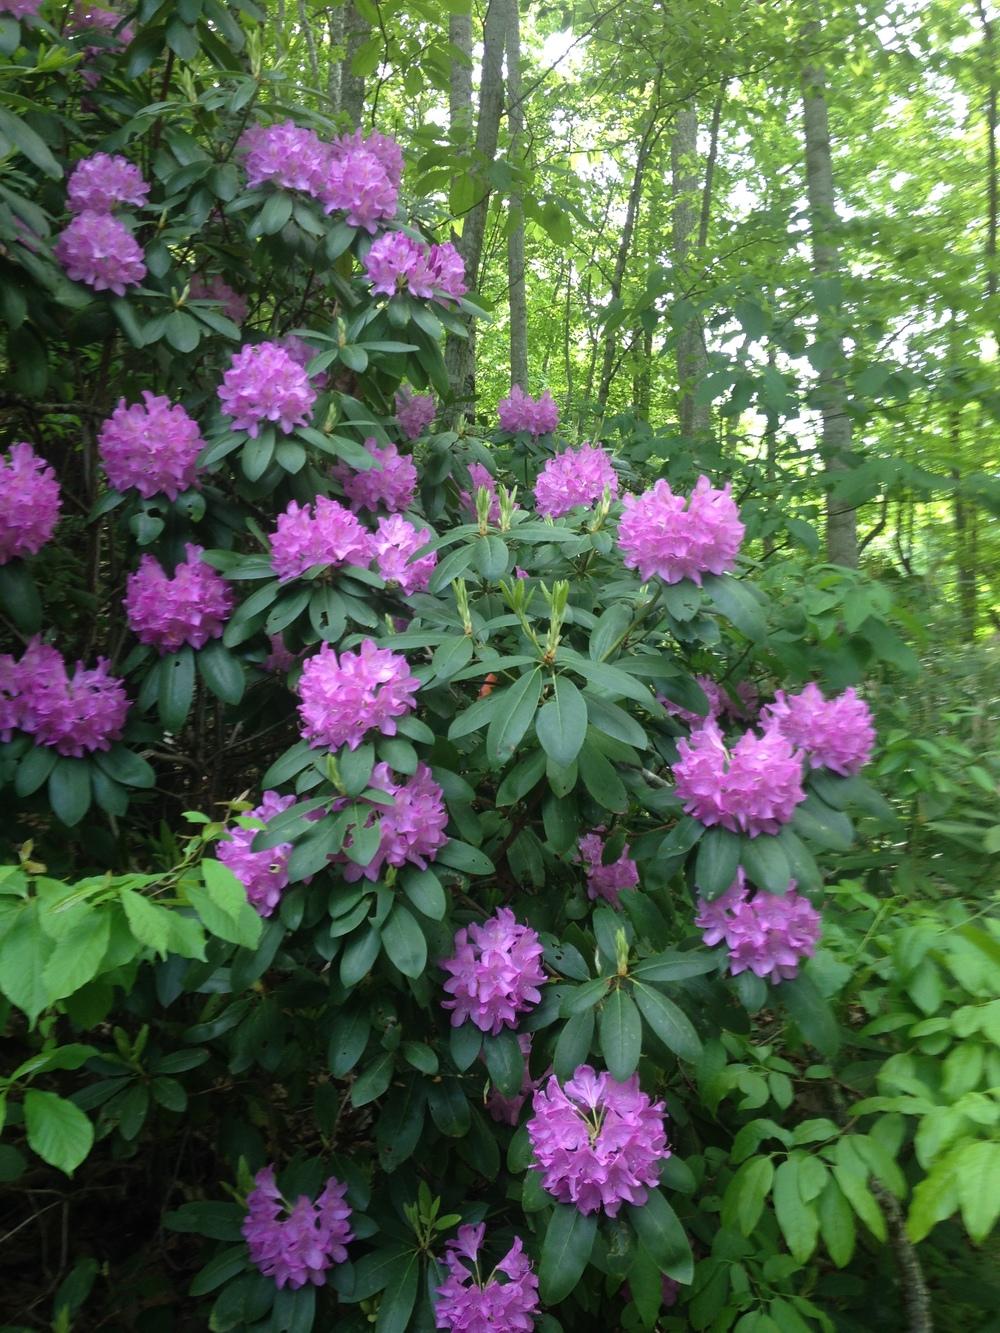 Backyard rhododendron